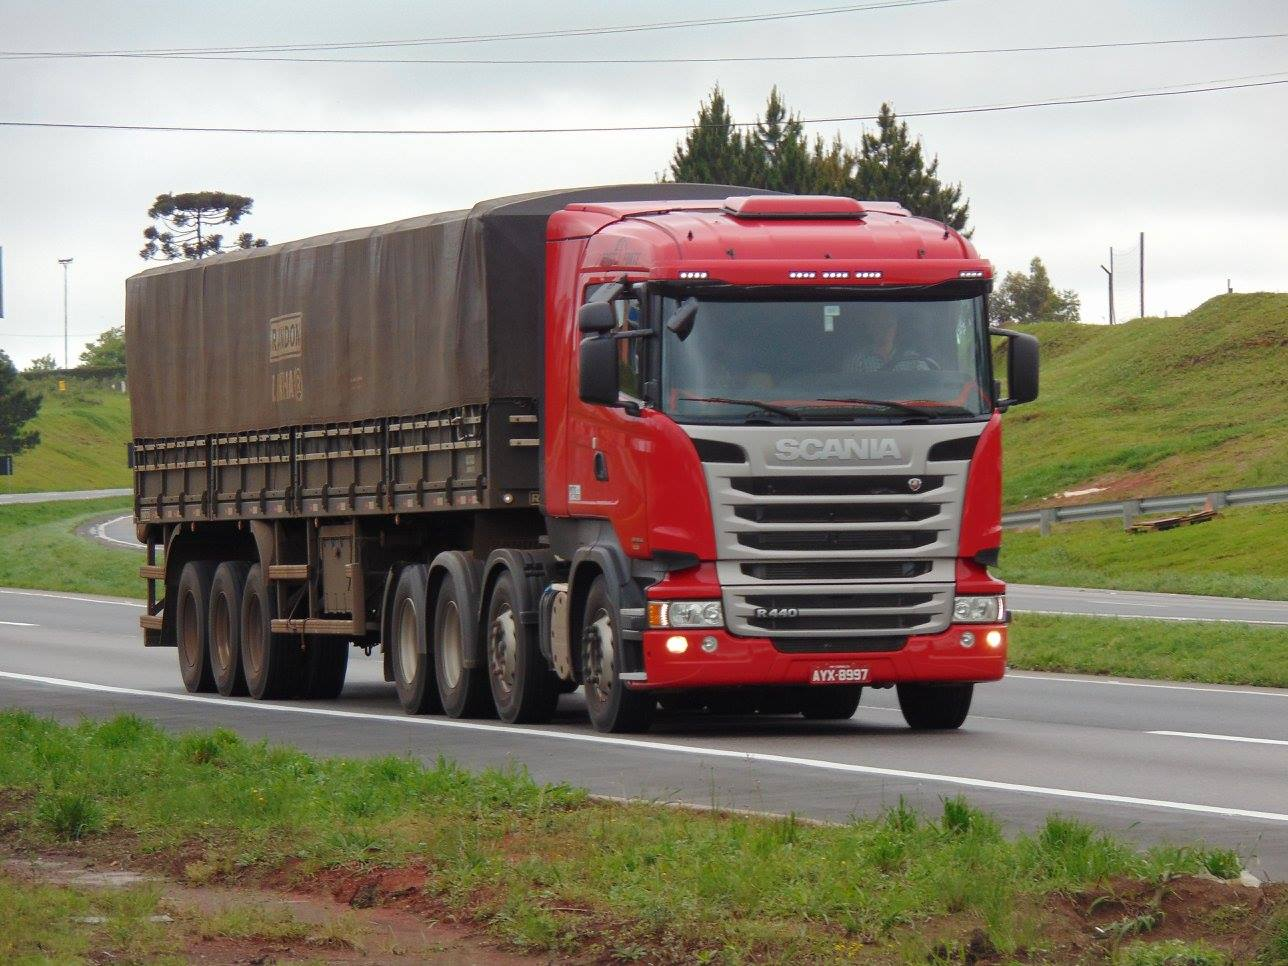 Scania-photo-5-1--2015-5